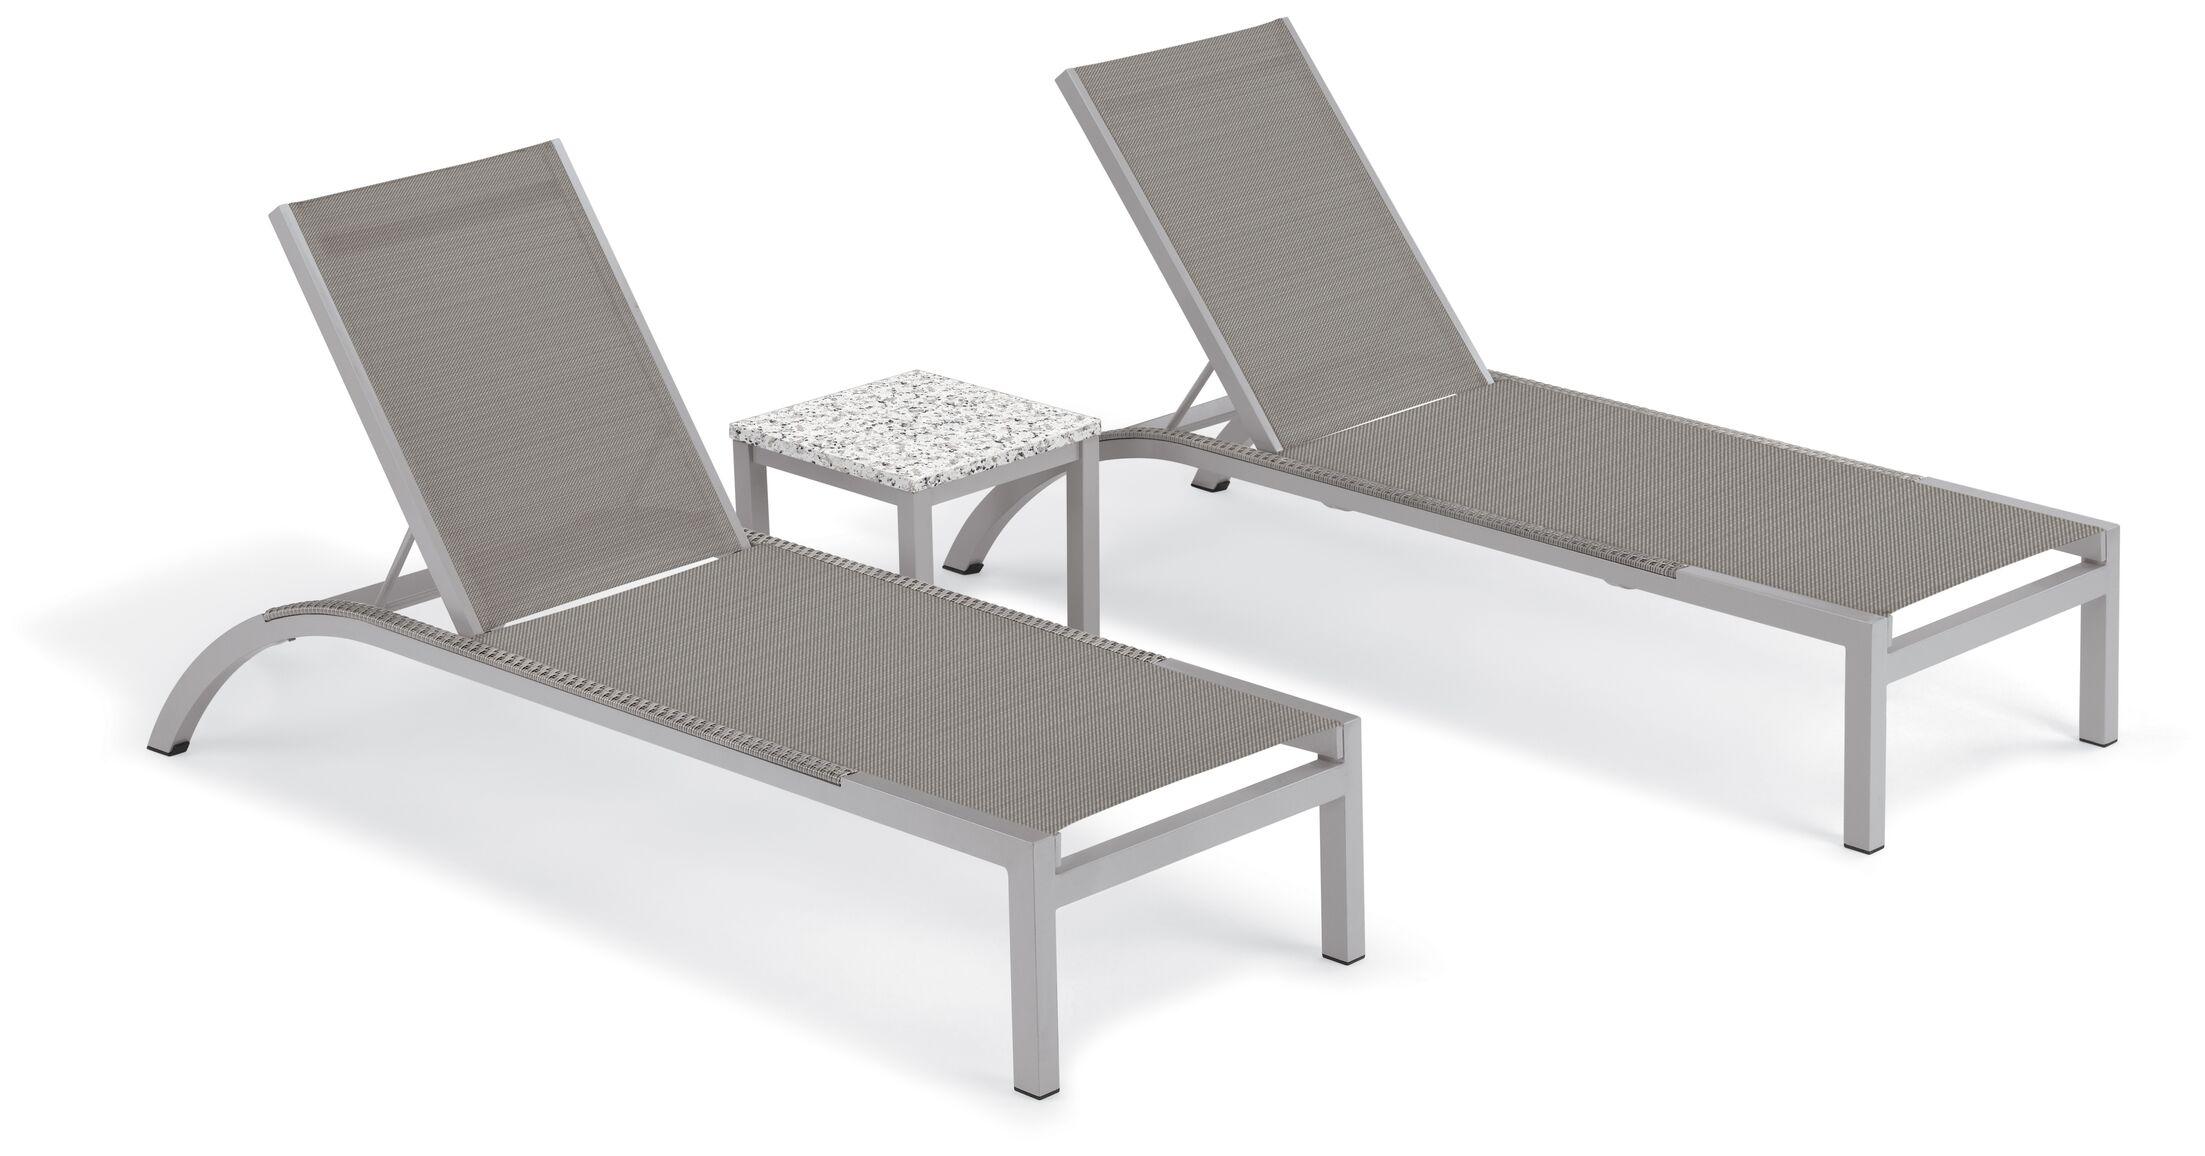 Saint-Pierre Reclining Chaise Lounge with End Table Color: Titanium, Tabletop Color: Ash